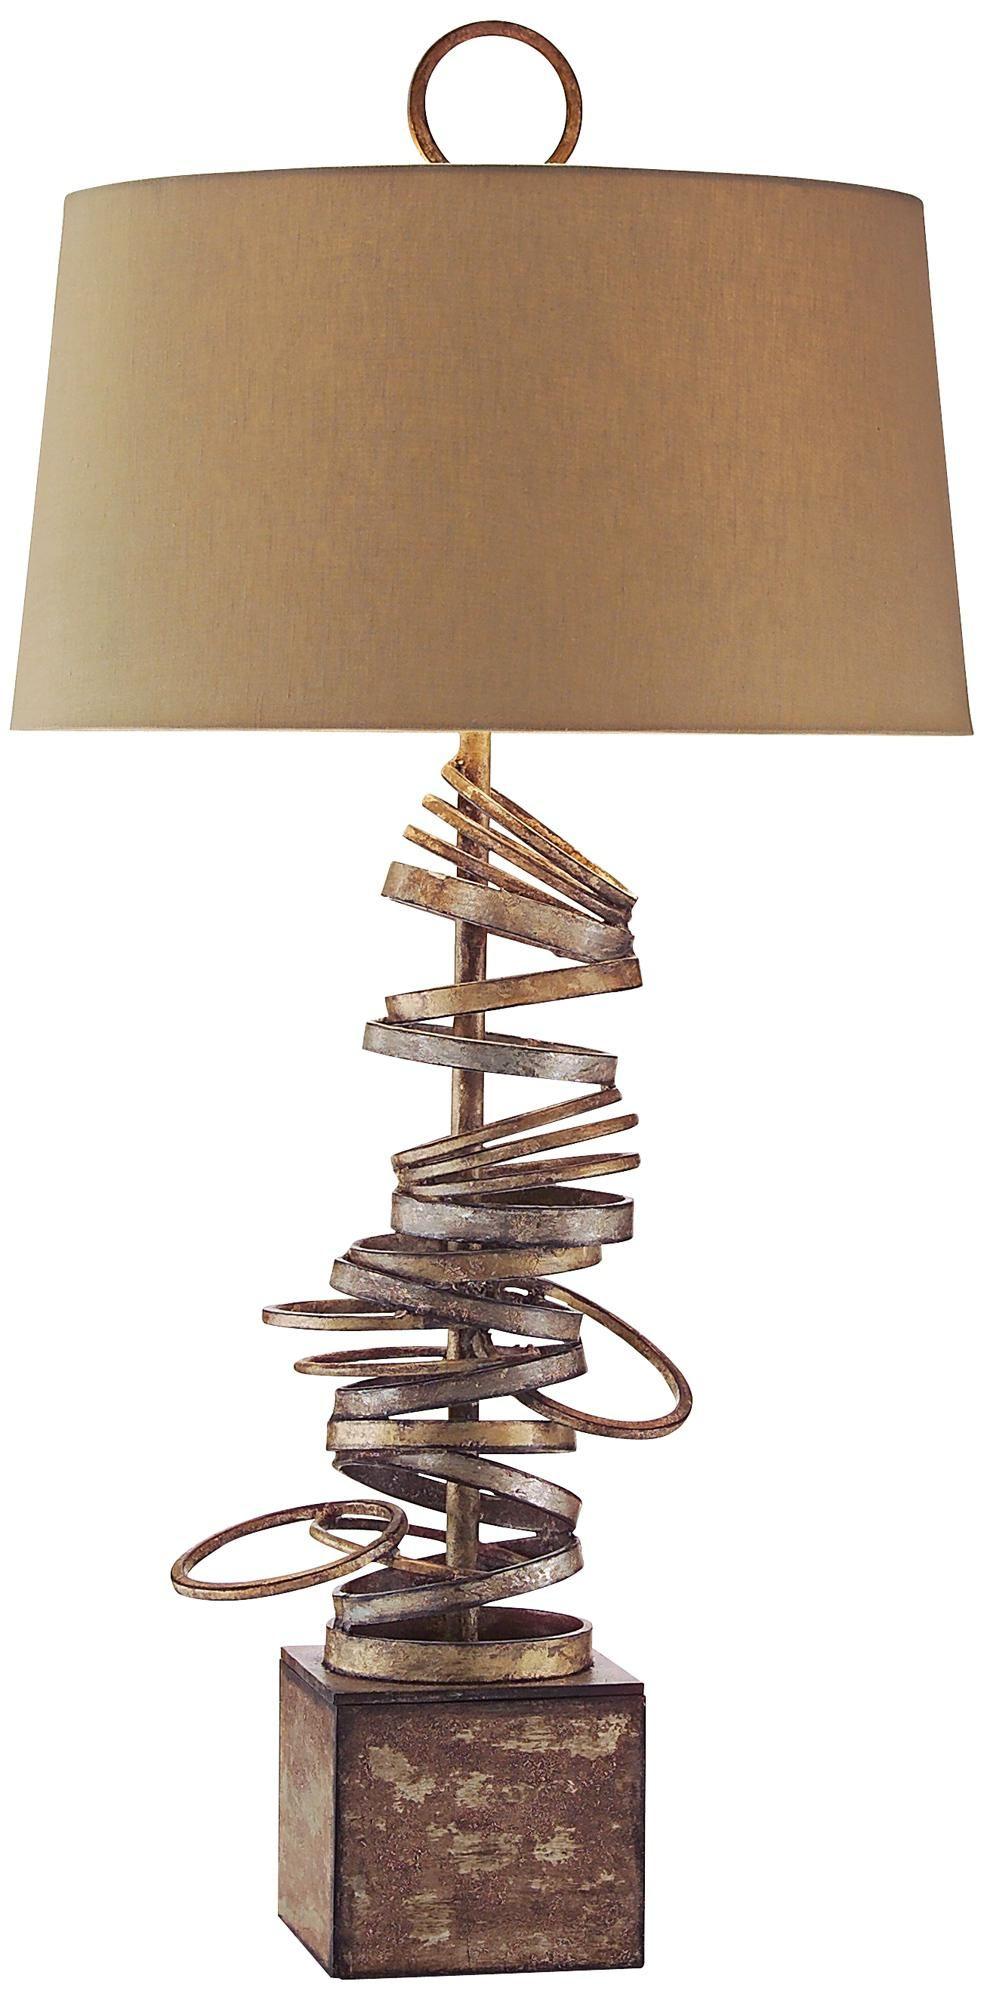 John richard iron ring table lamp lamps products and rings john richard iron ring table lamp geotapseo Image collections